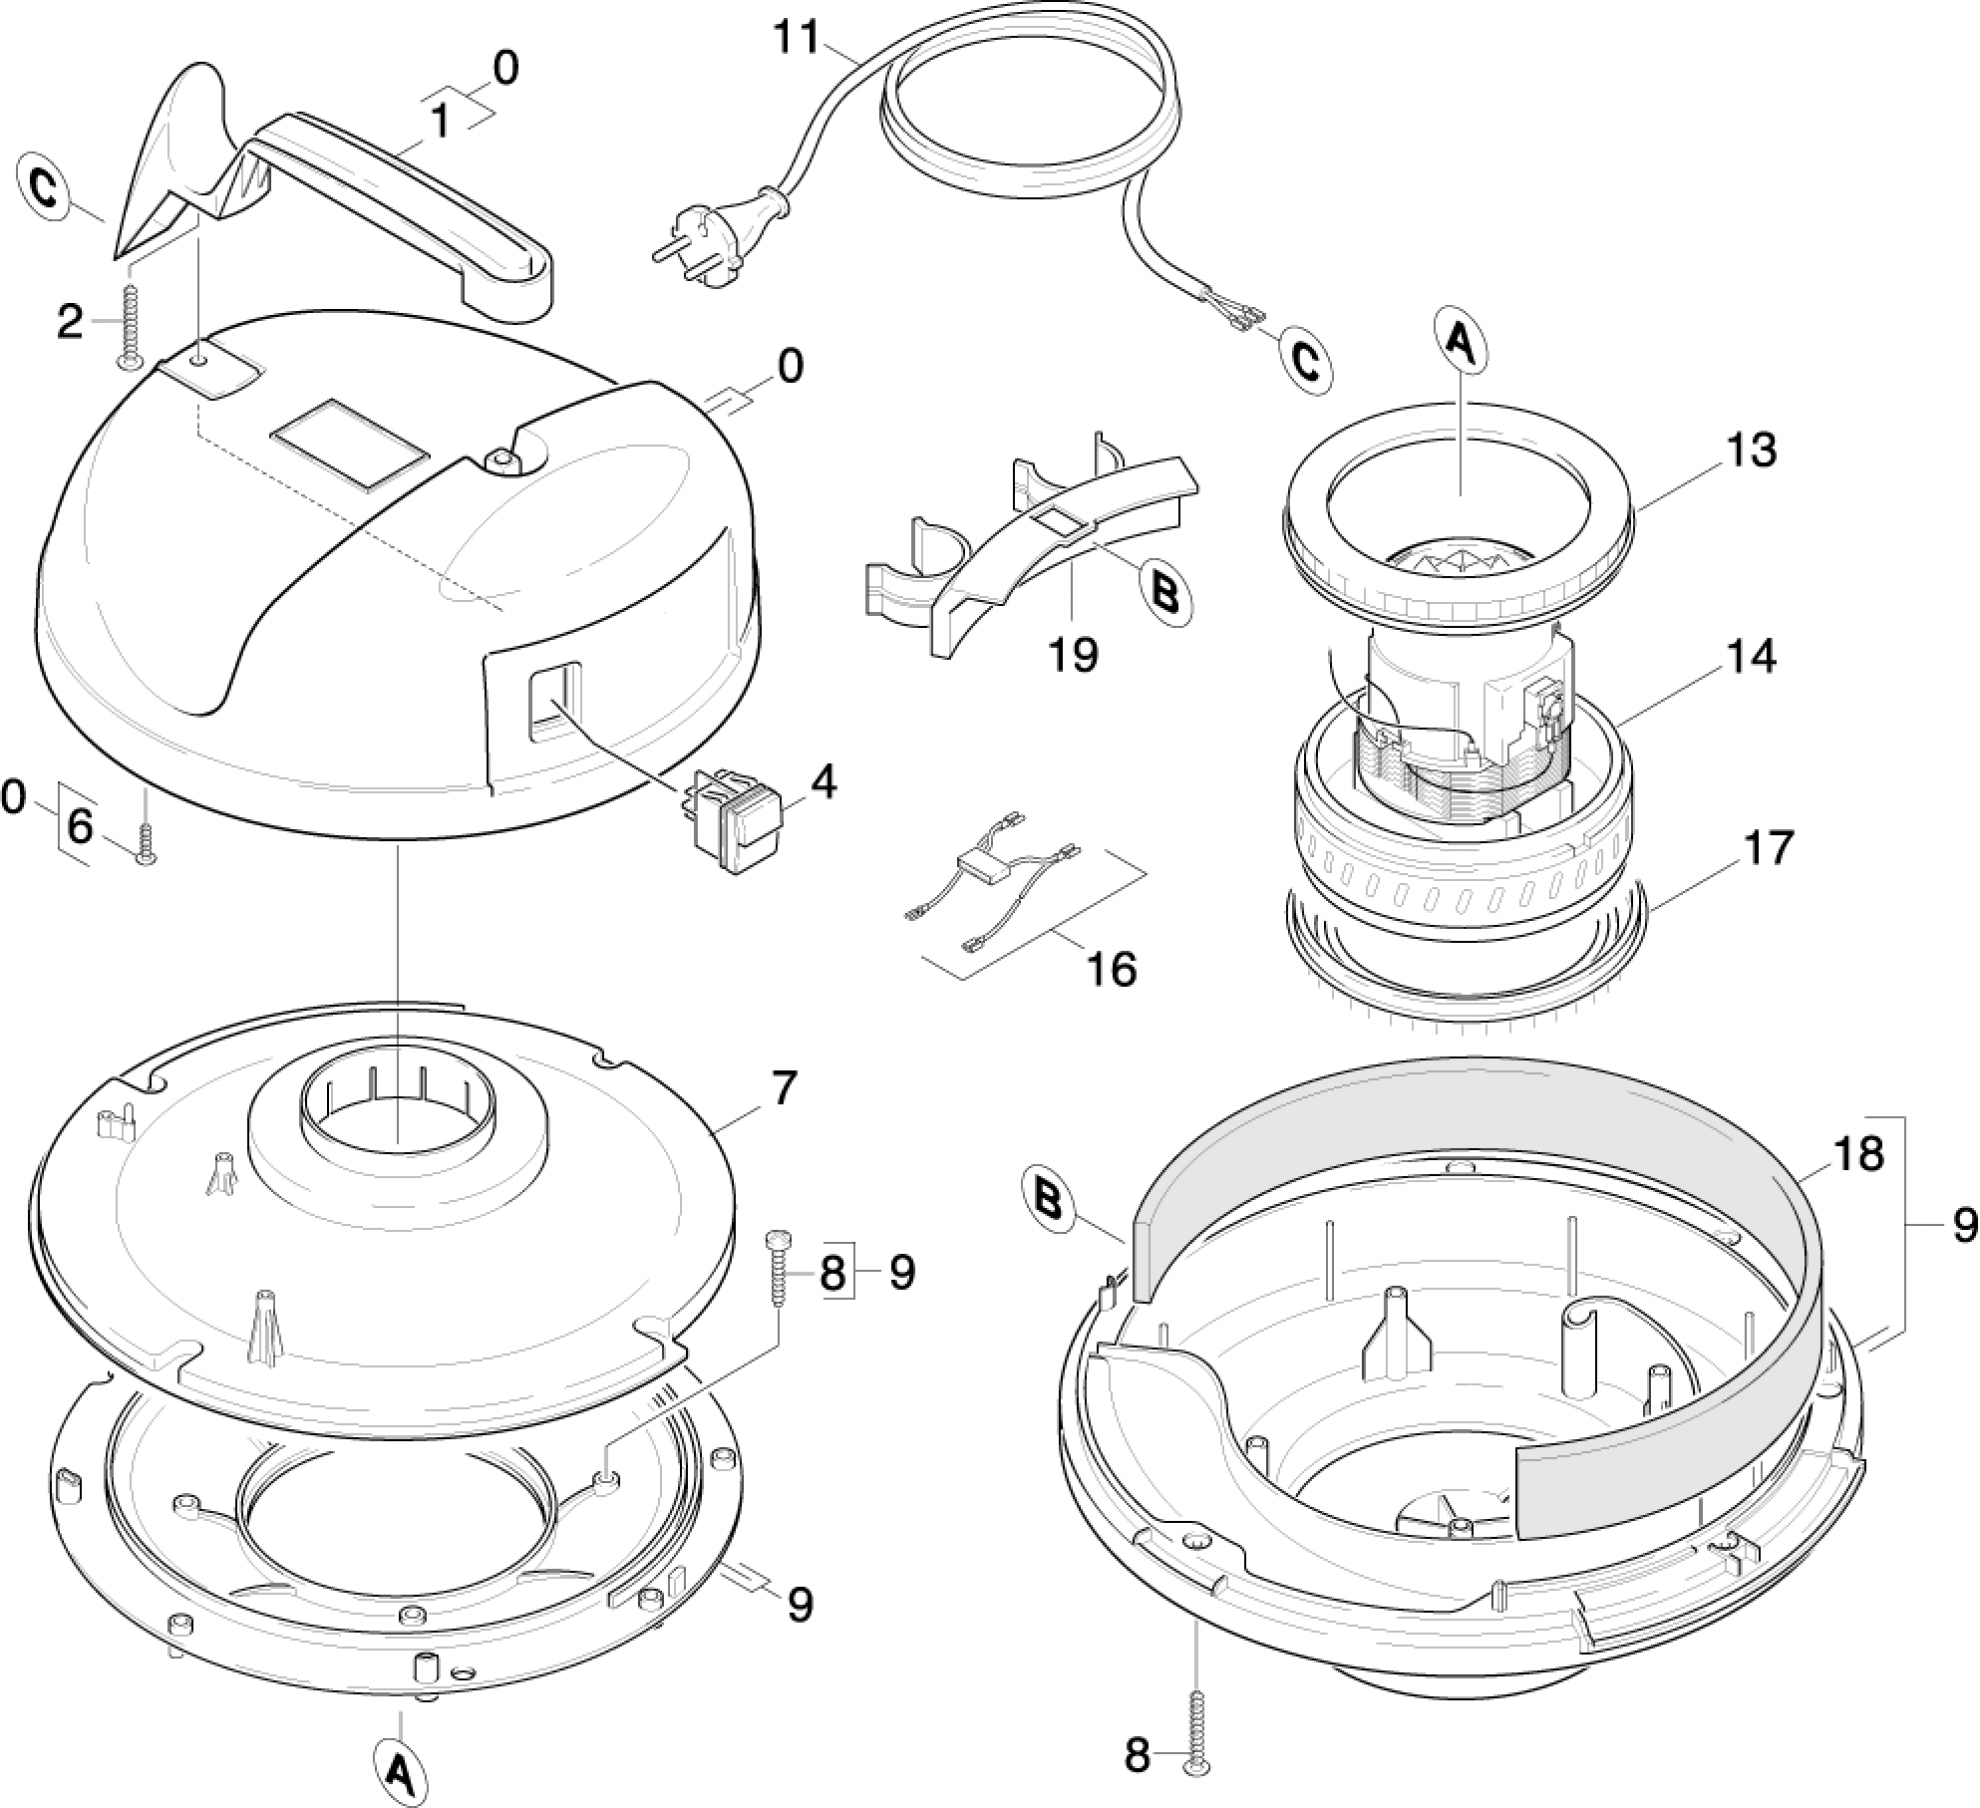 pi ces d tach es aspirateur karcher k 2150 eu. Black Bedroom Furniture Sets. Home Design Ideas